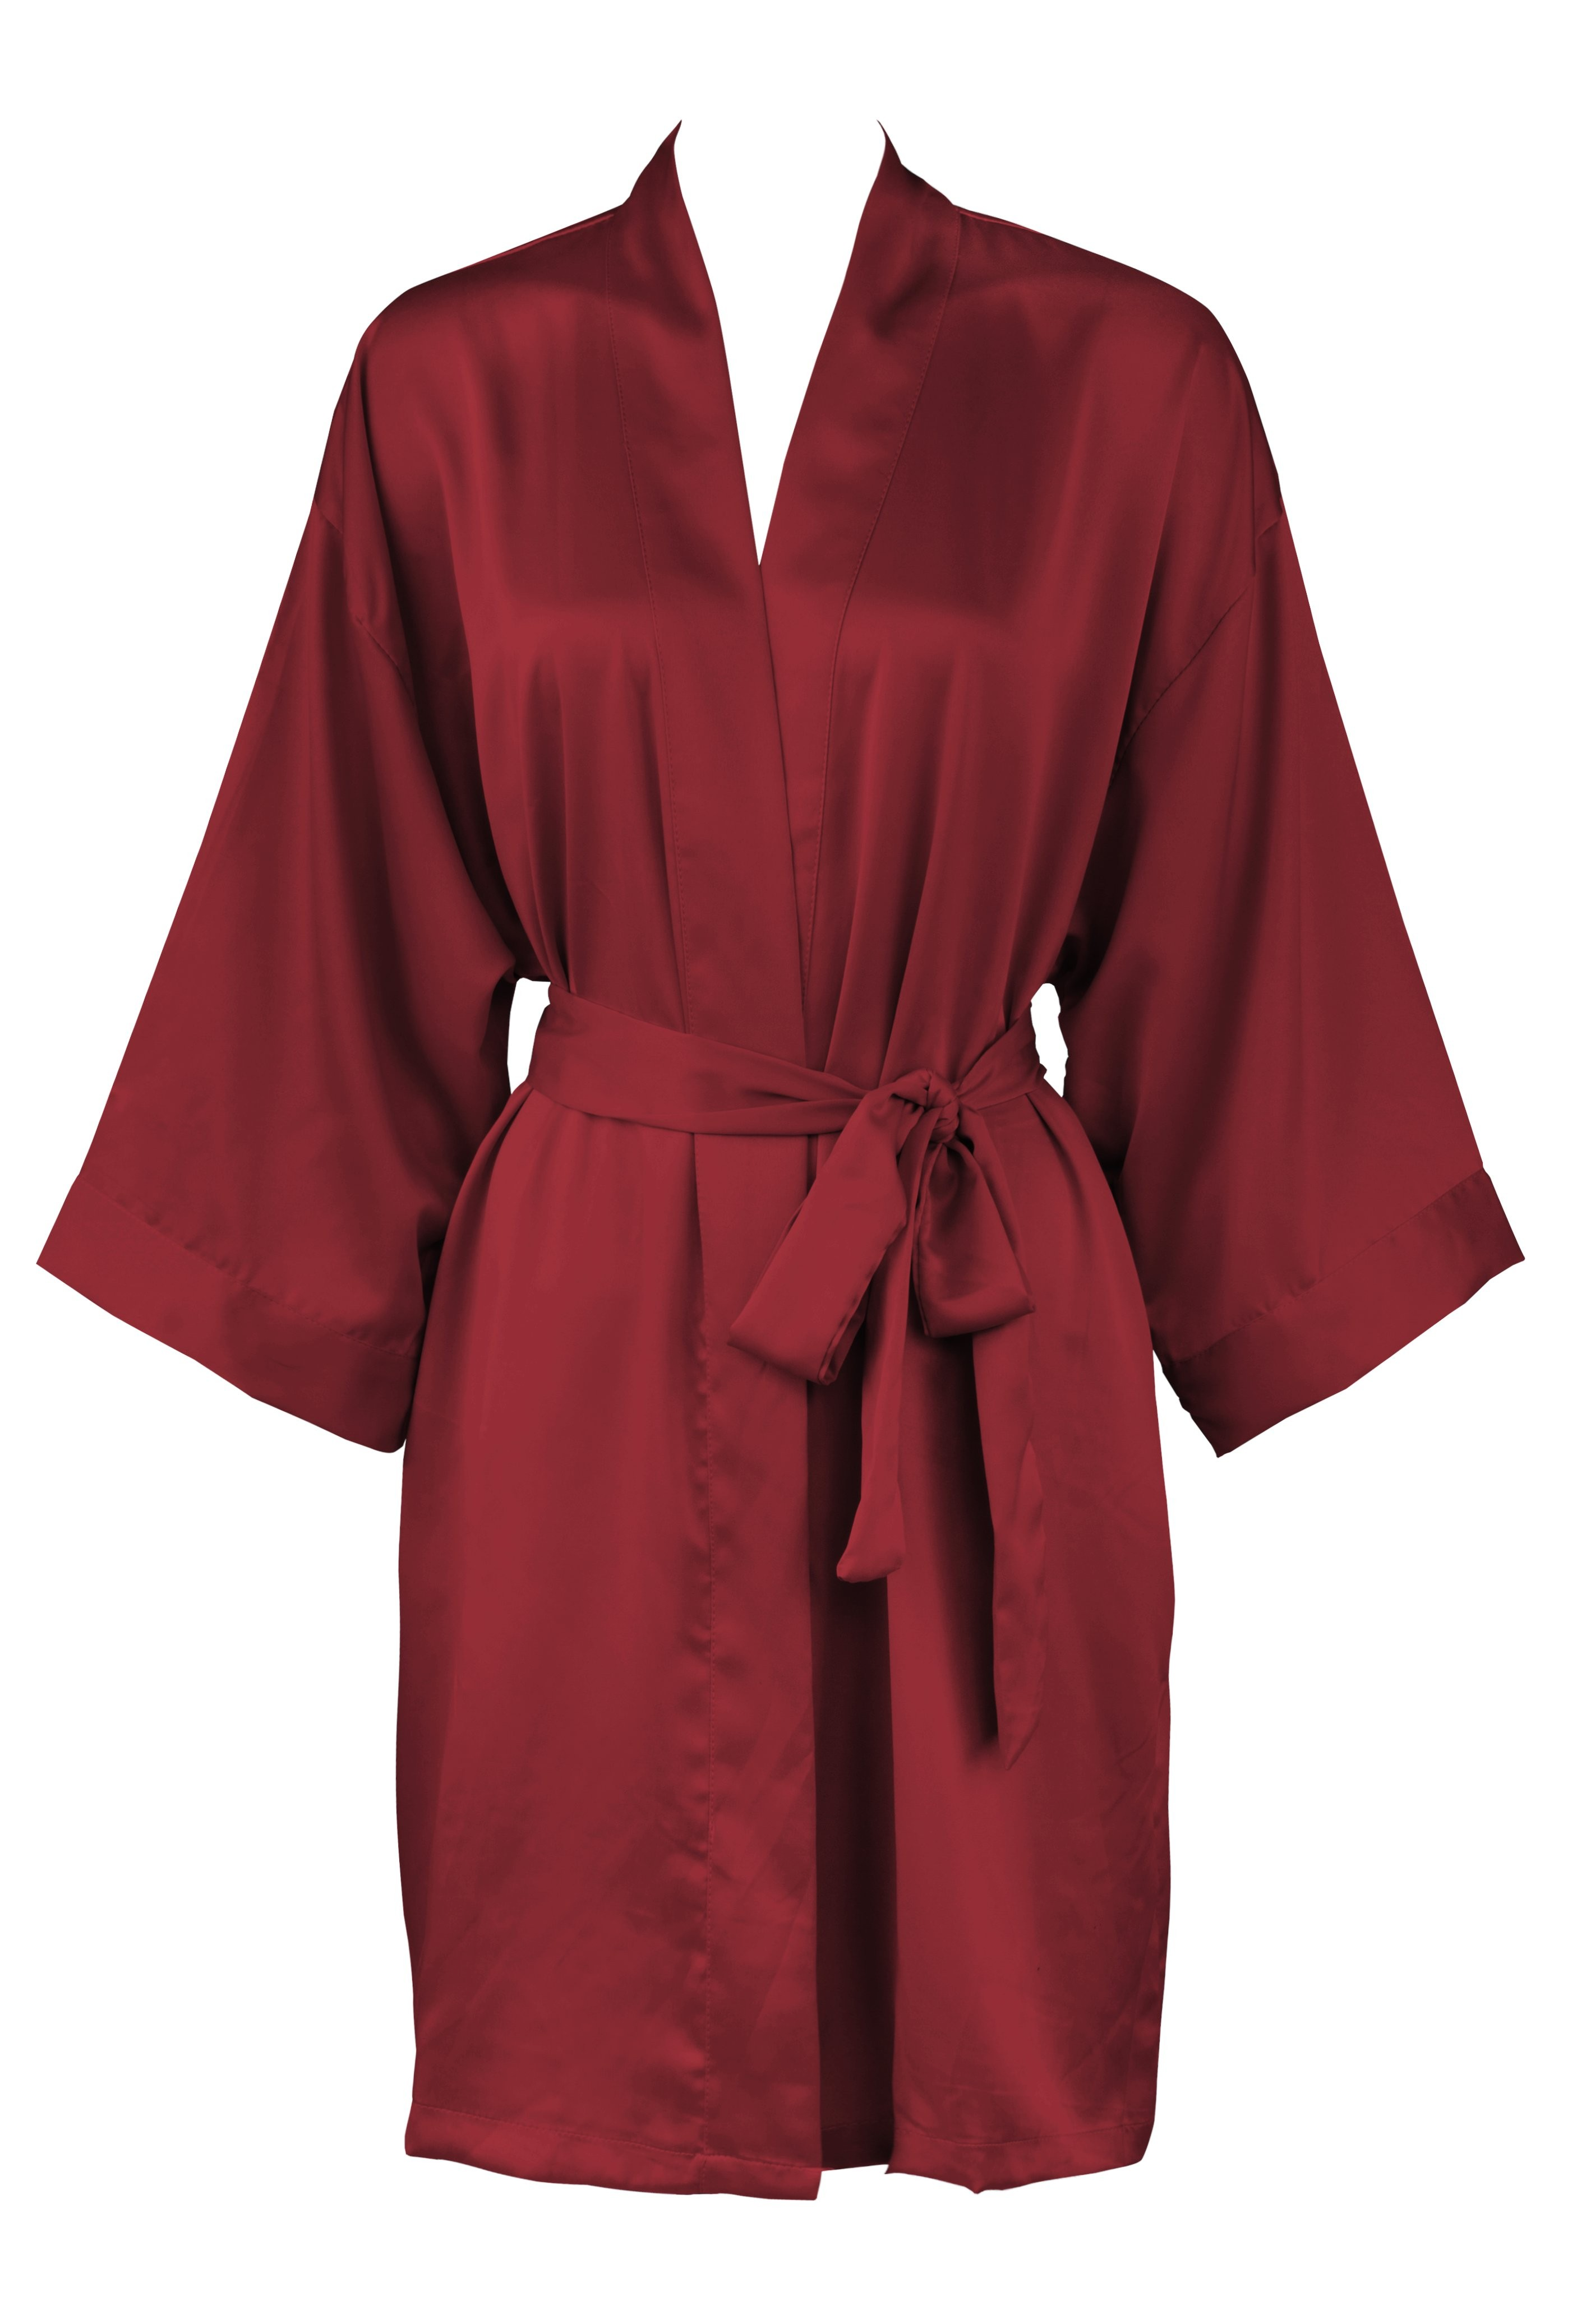 Leisureland Women s Matte Satin Kimono Robe Burgundy S M 5763171c2